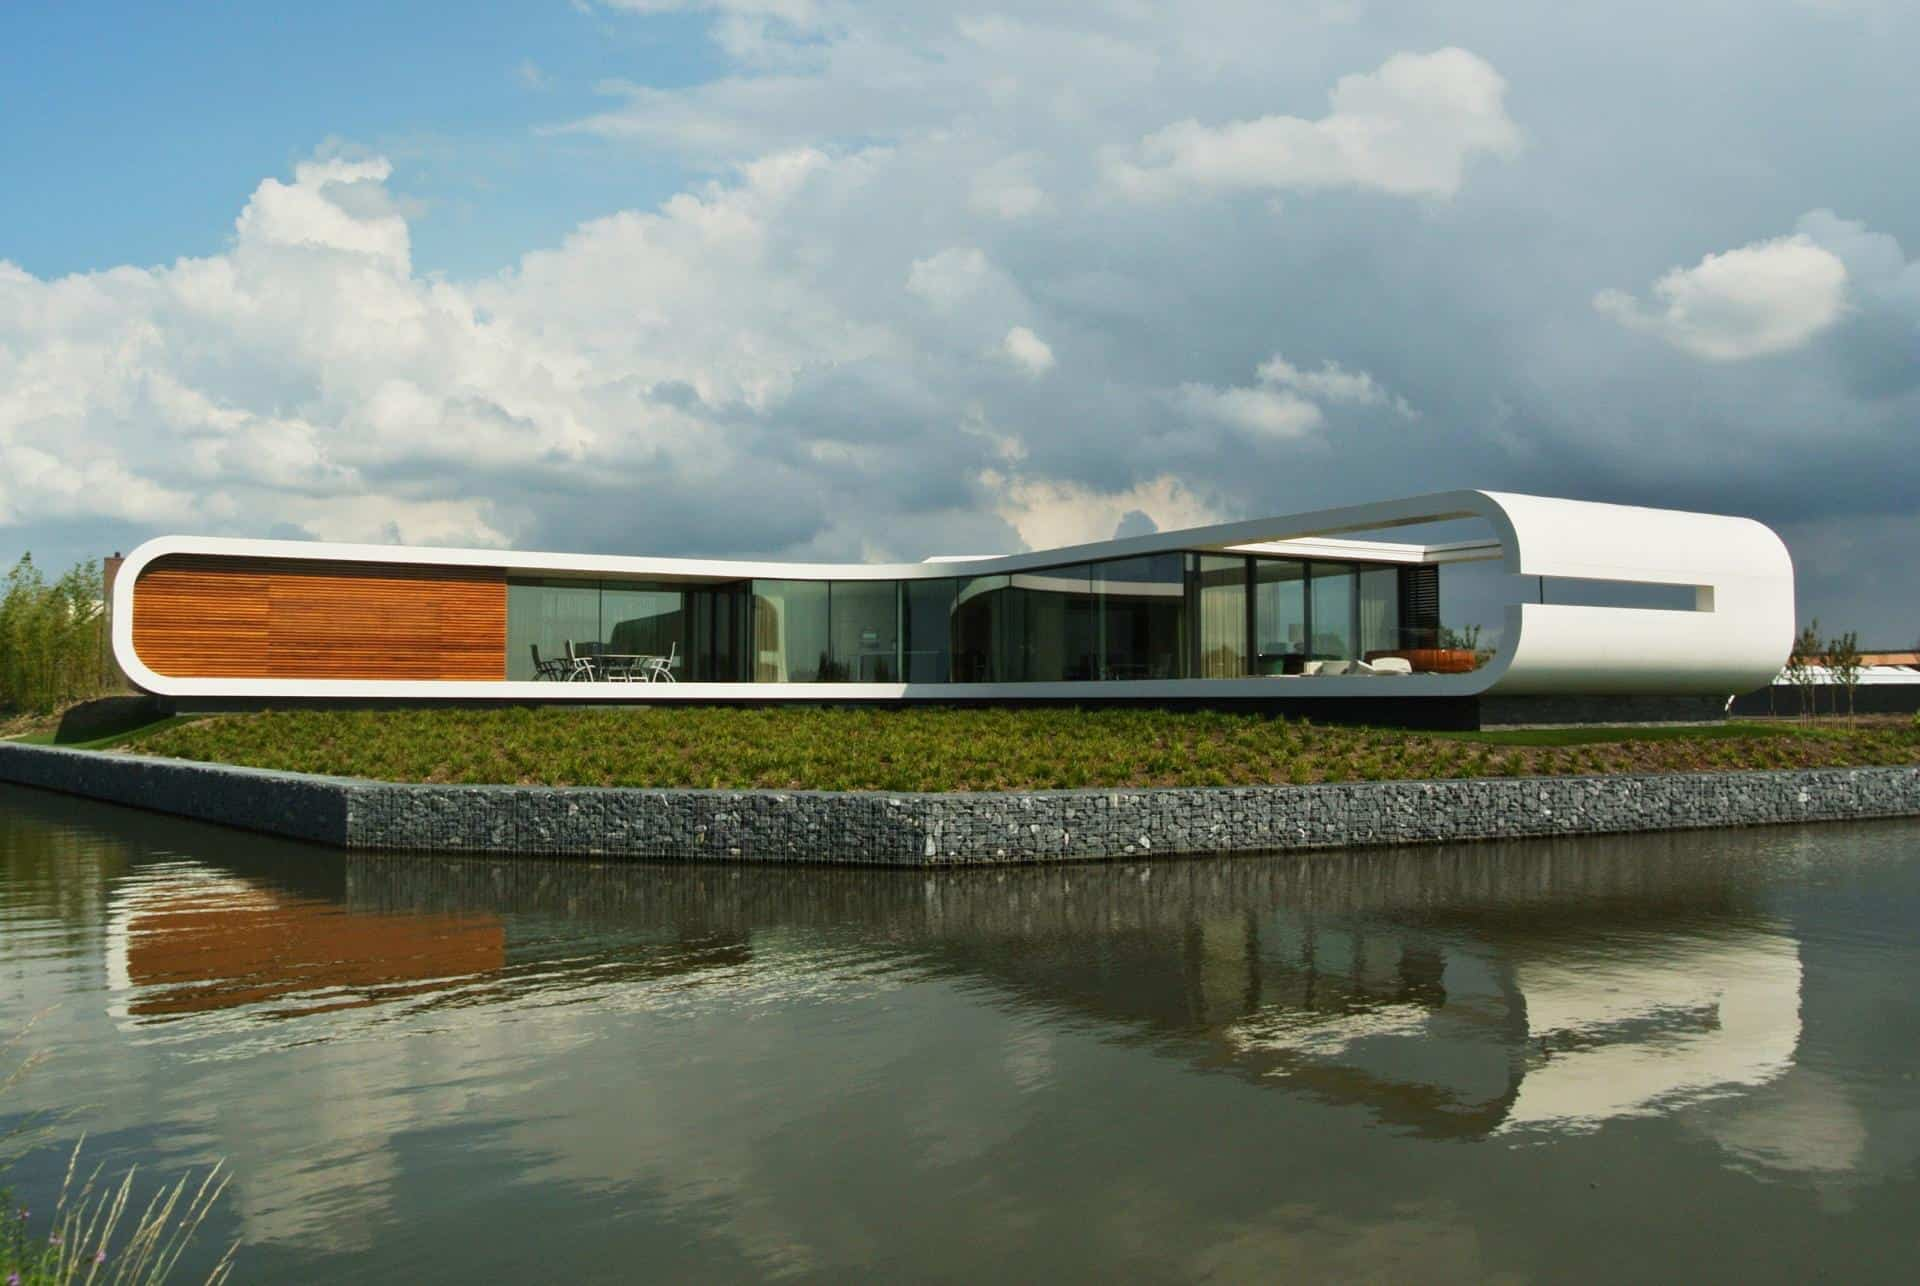 Best Kitchen Gallery: Futuristic Homes Ideas Trendir of Futuristic Home Designs  on rachelxblog.com